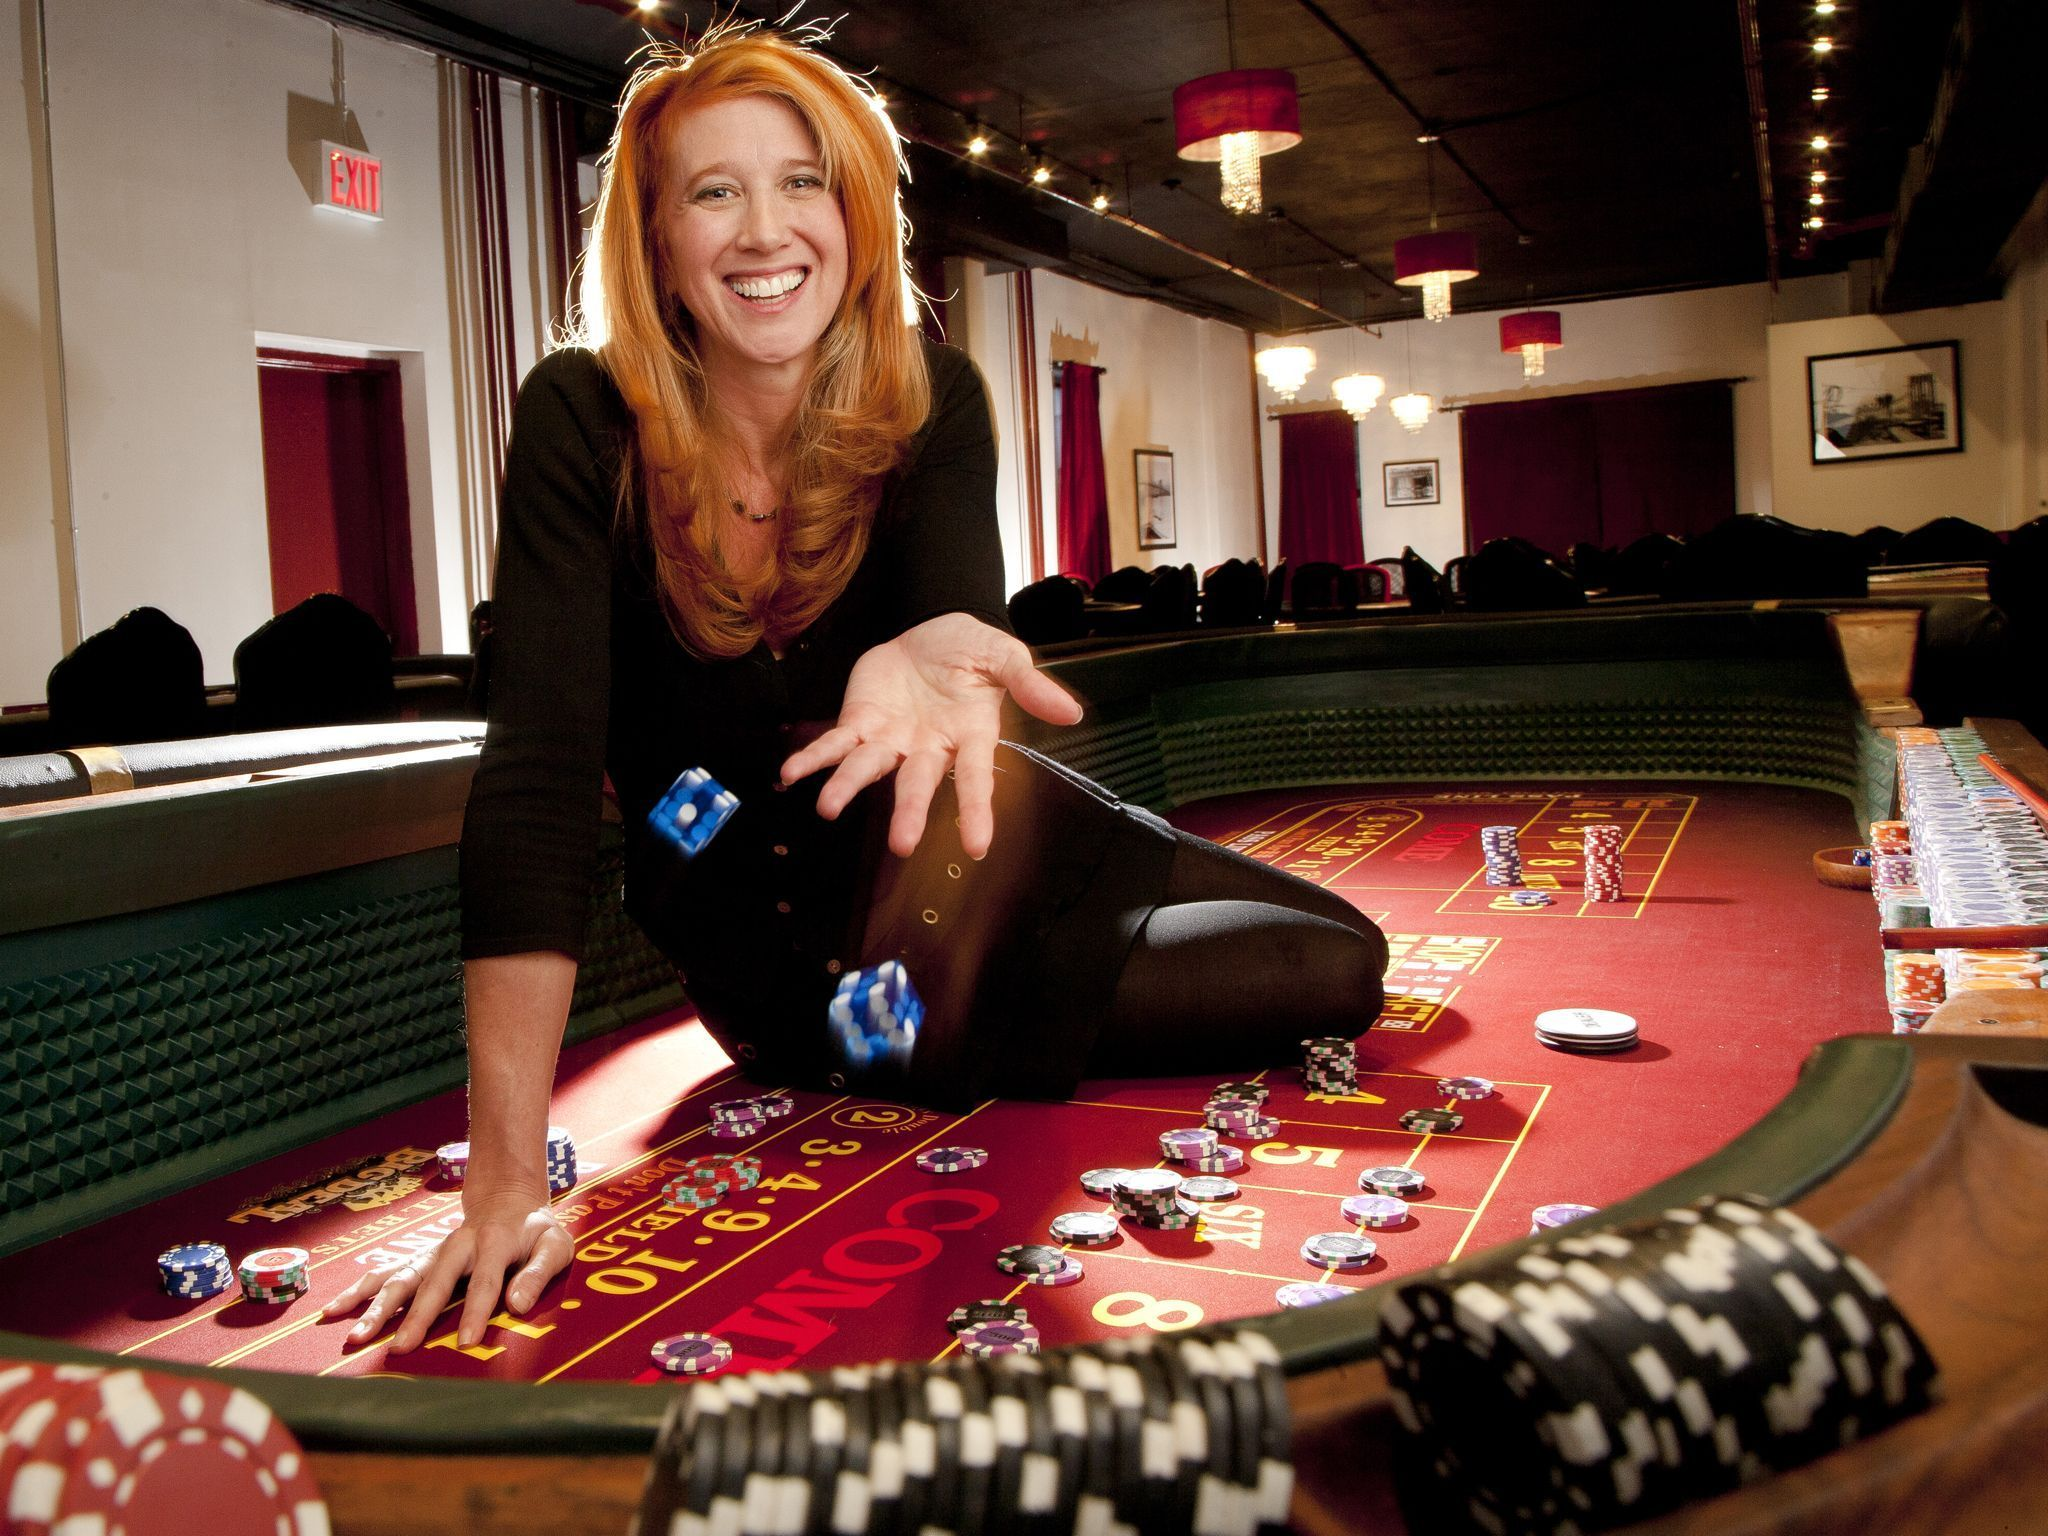 Noth east gaming casinos horse race gambling terms